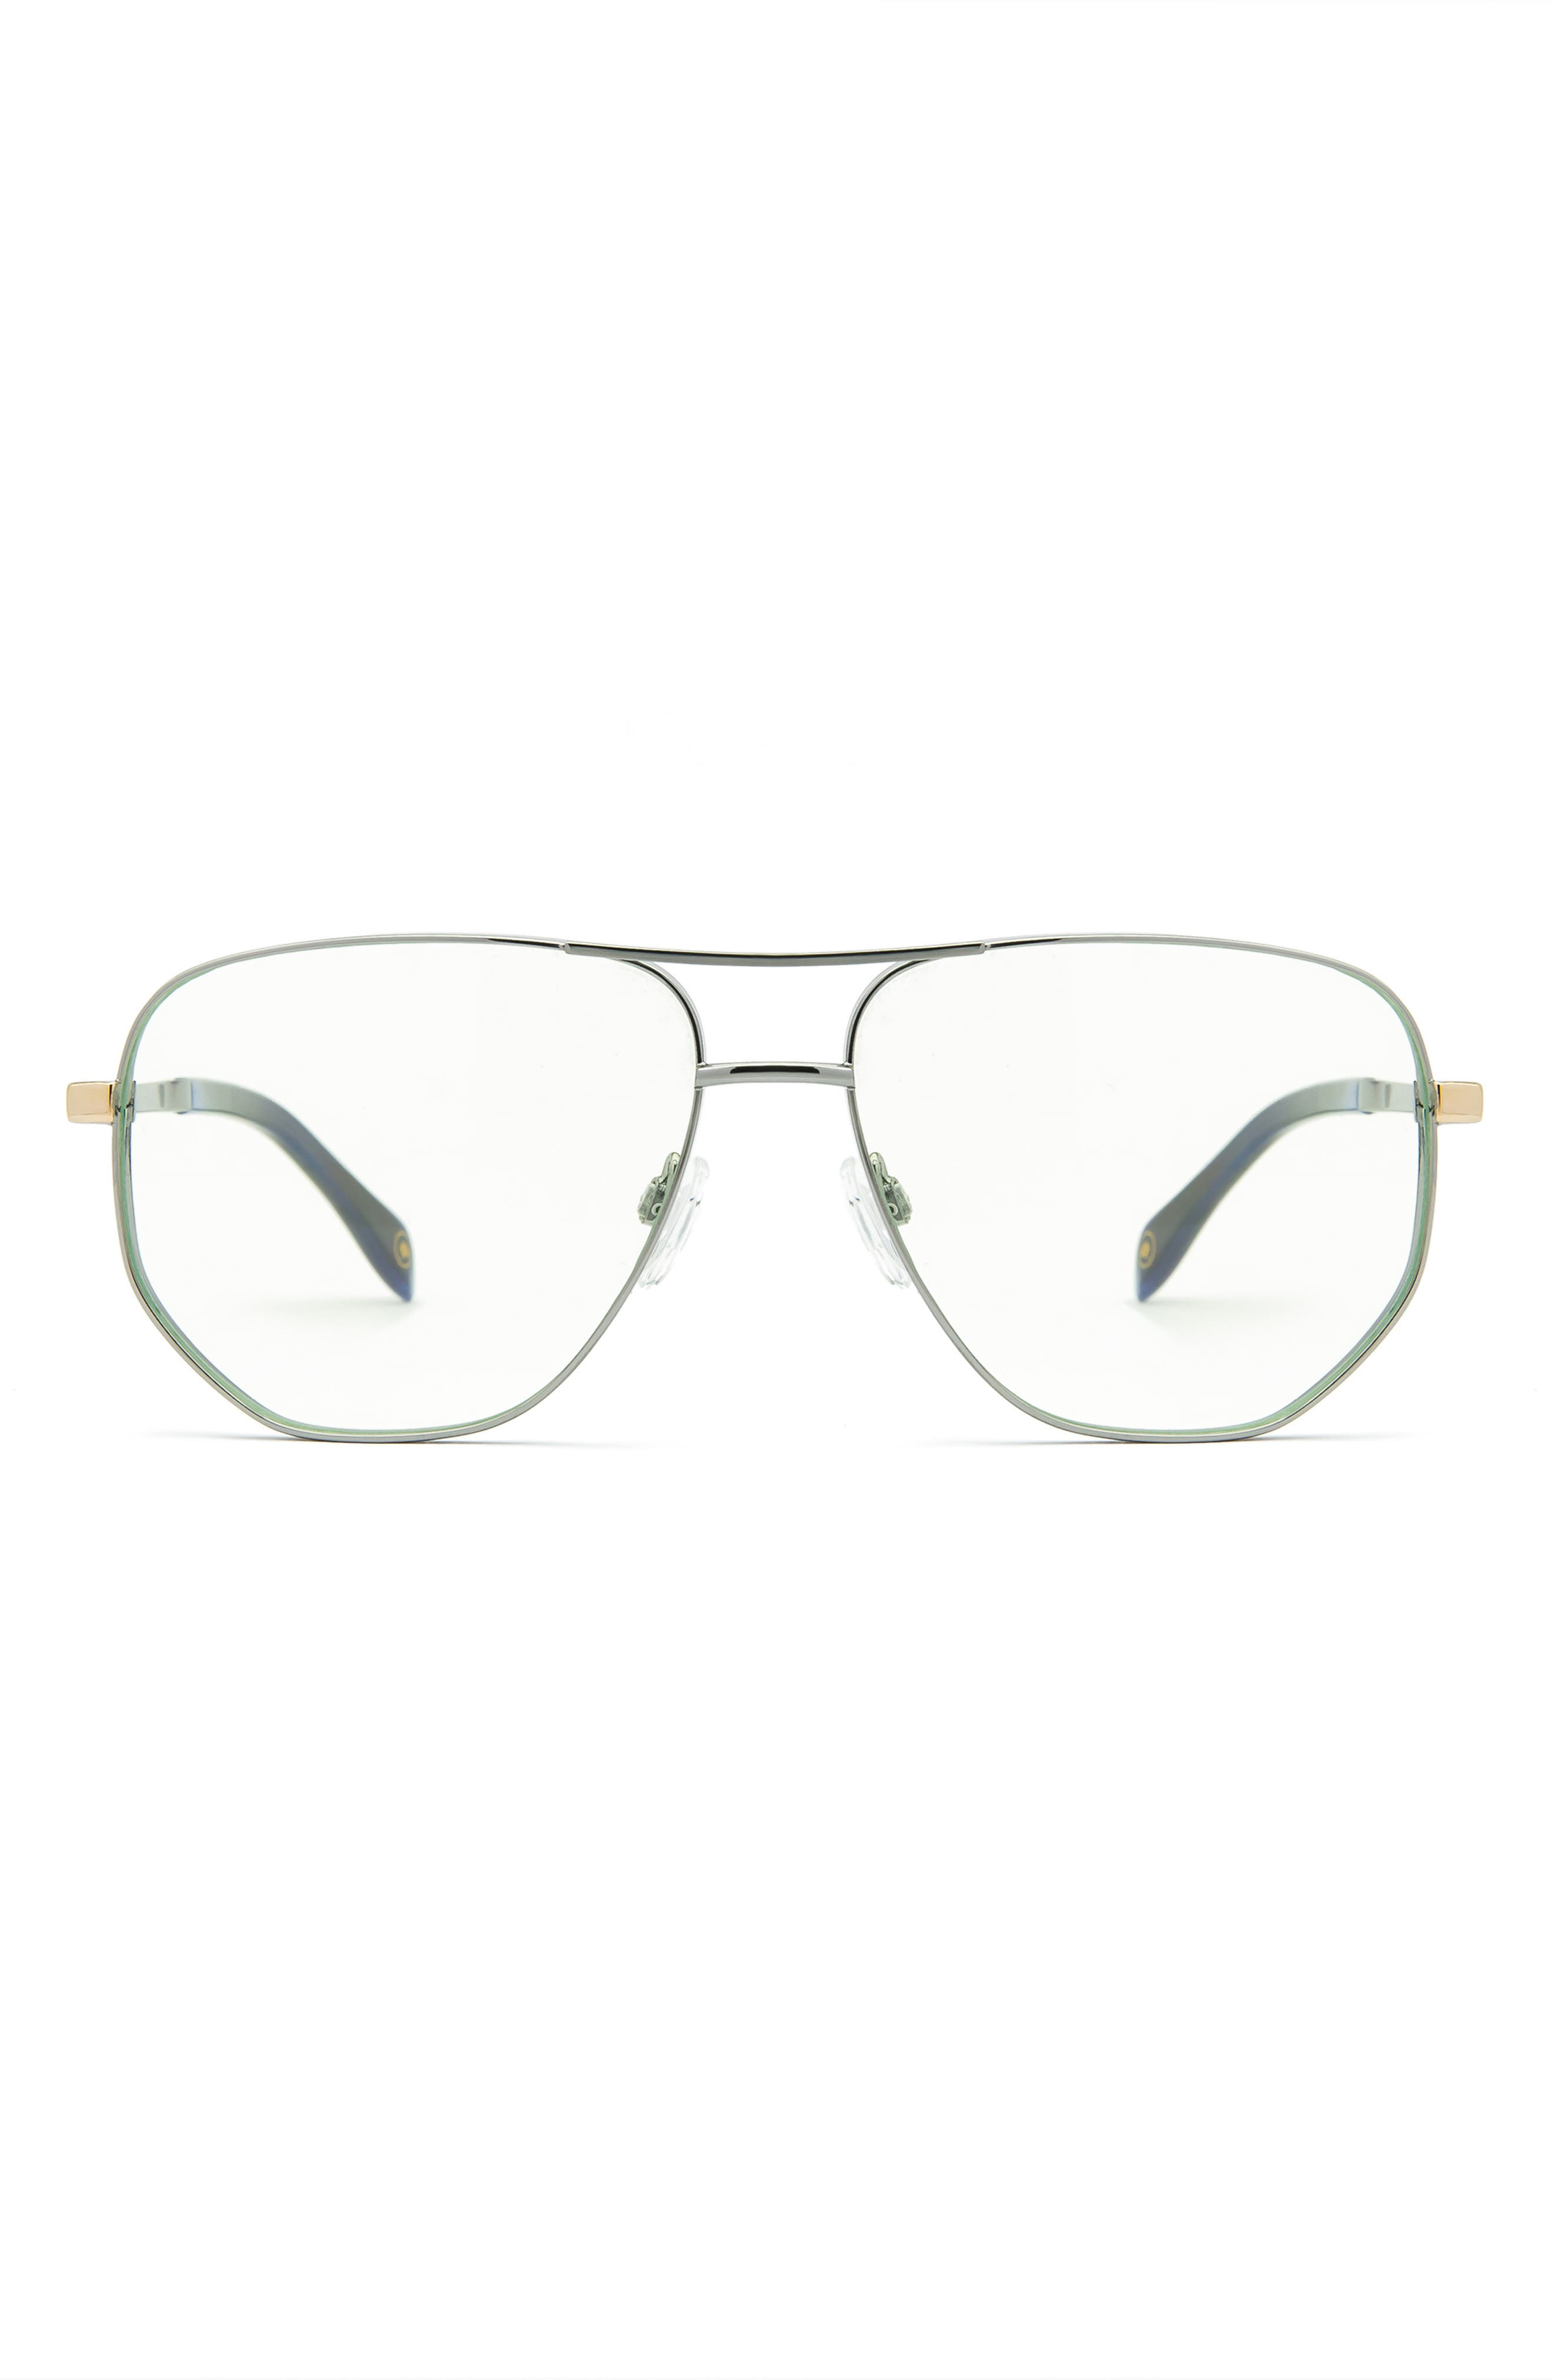 57mm Aviator Blue Light Blocking Glasses